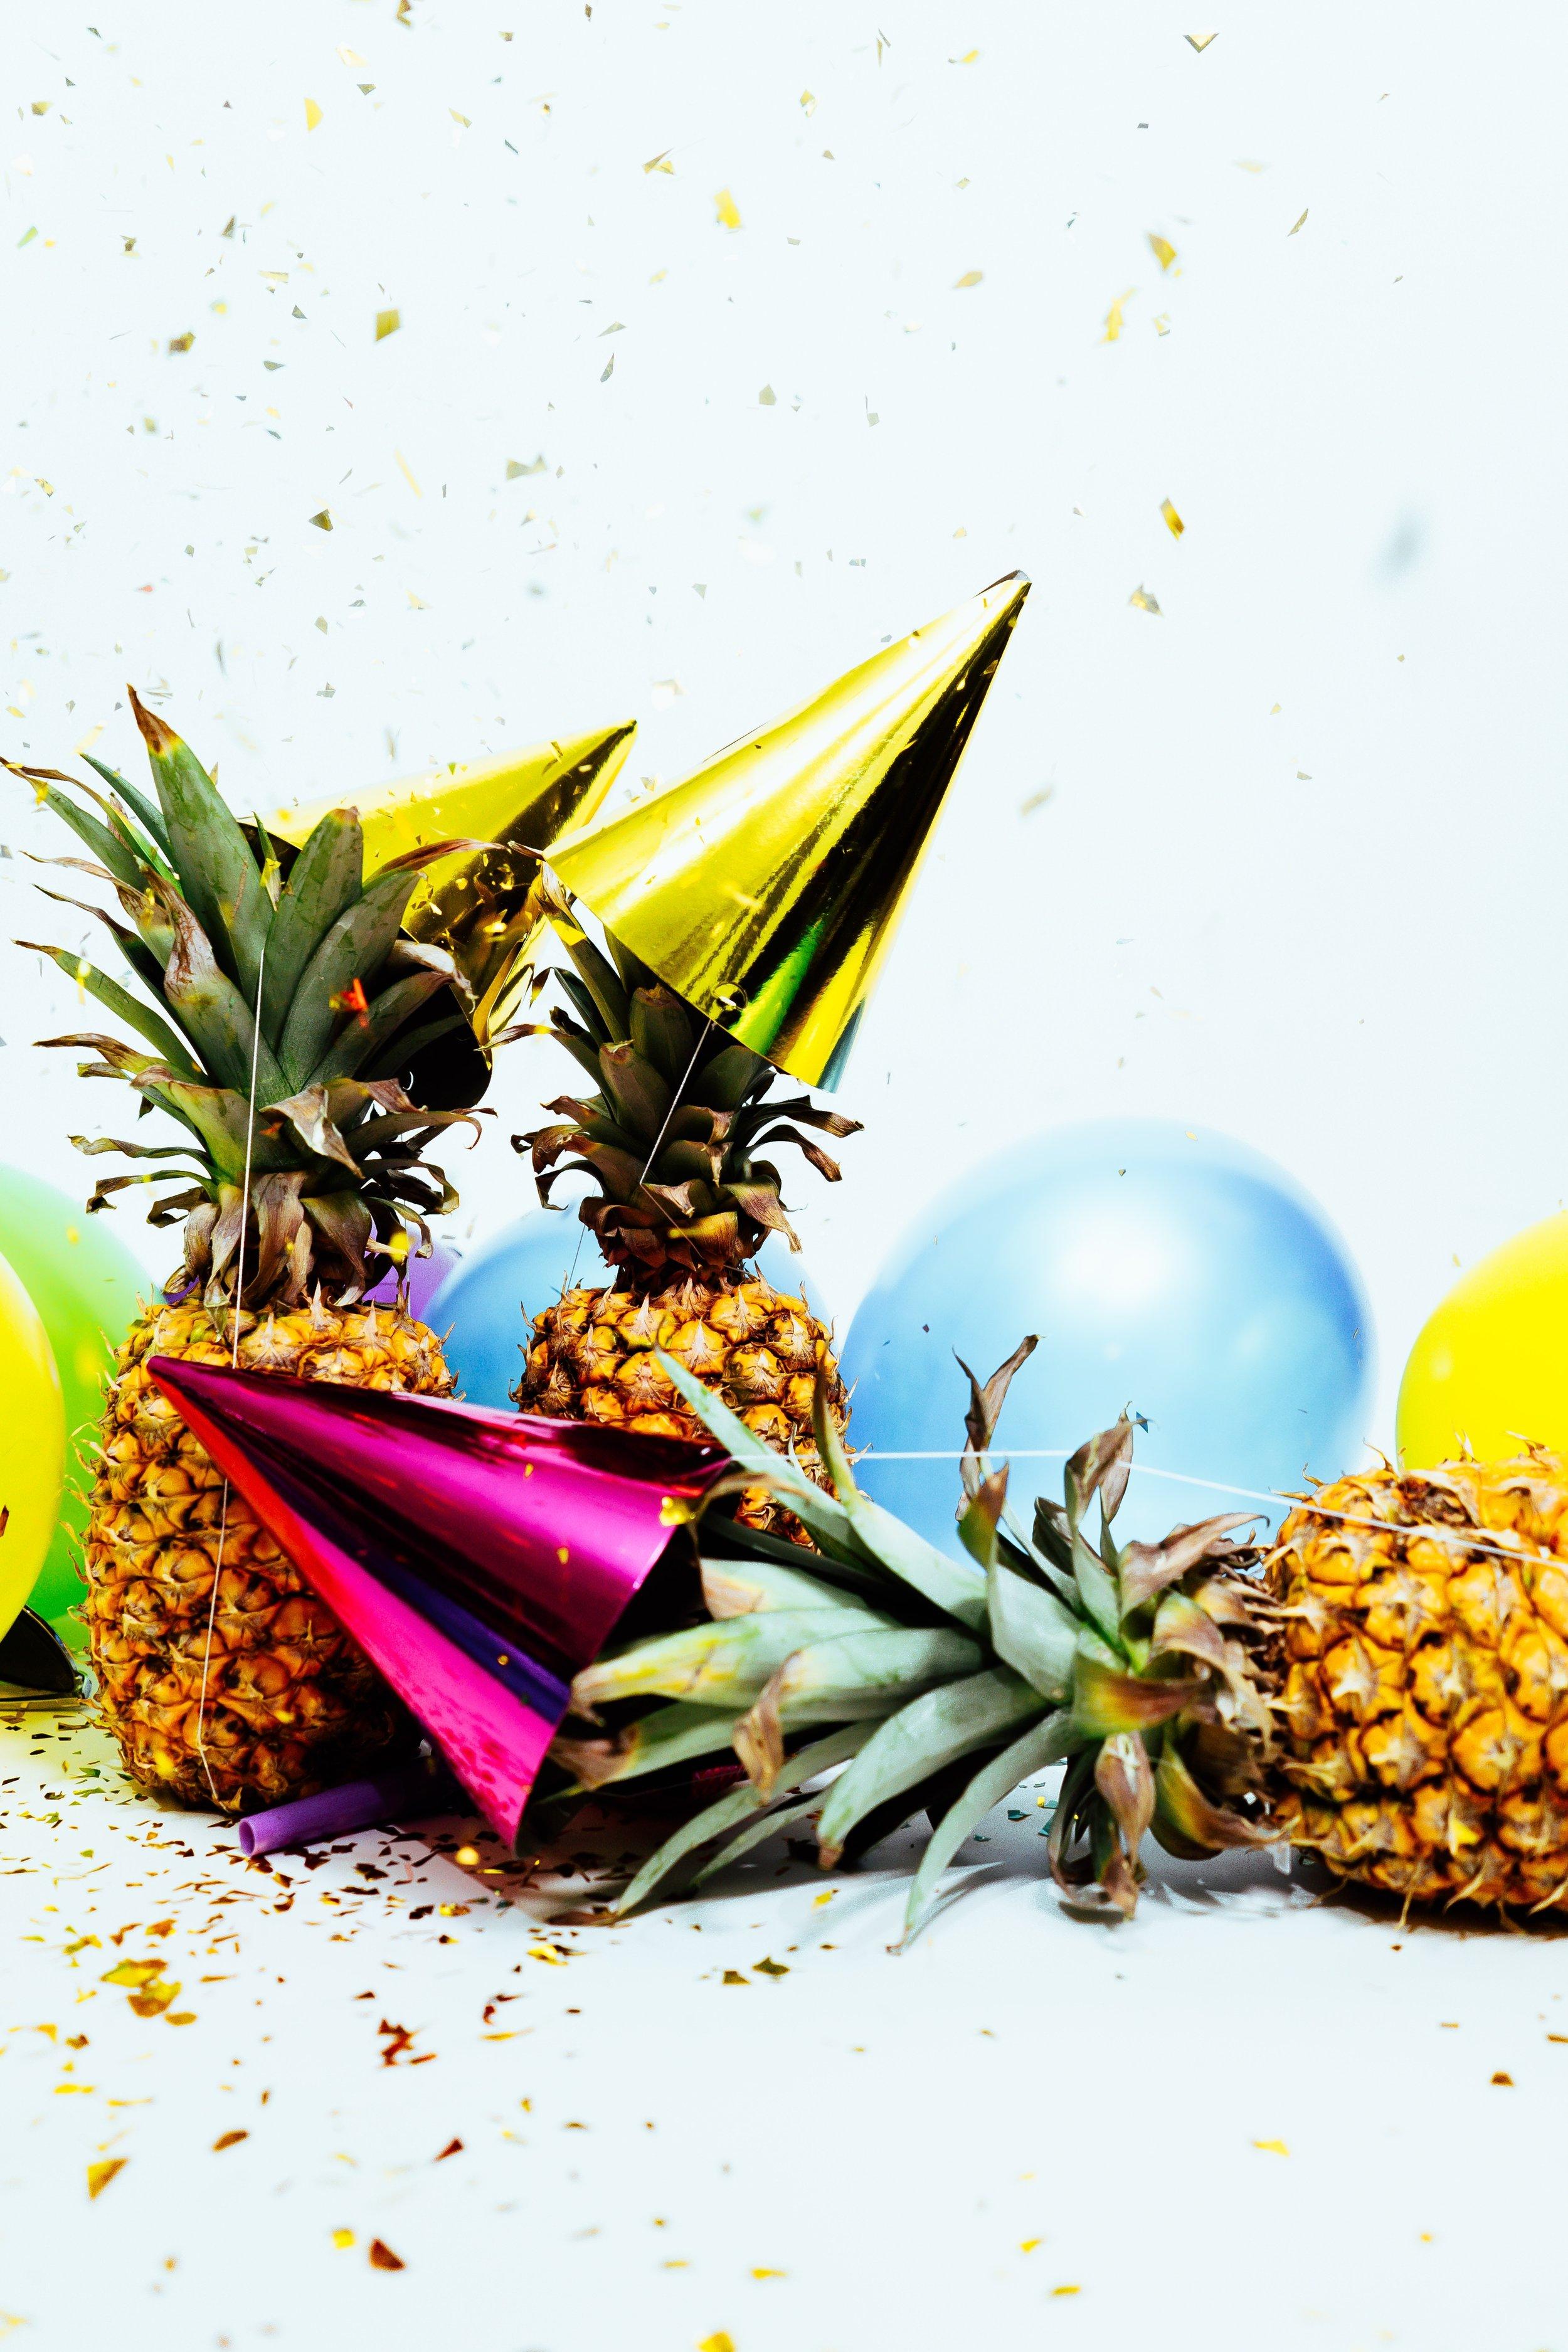 balloons-birthday-celebrate-1071883.jpg